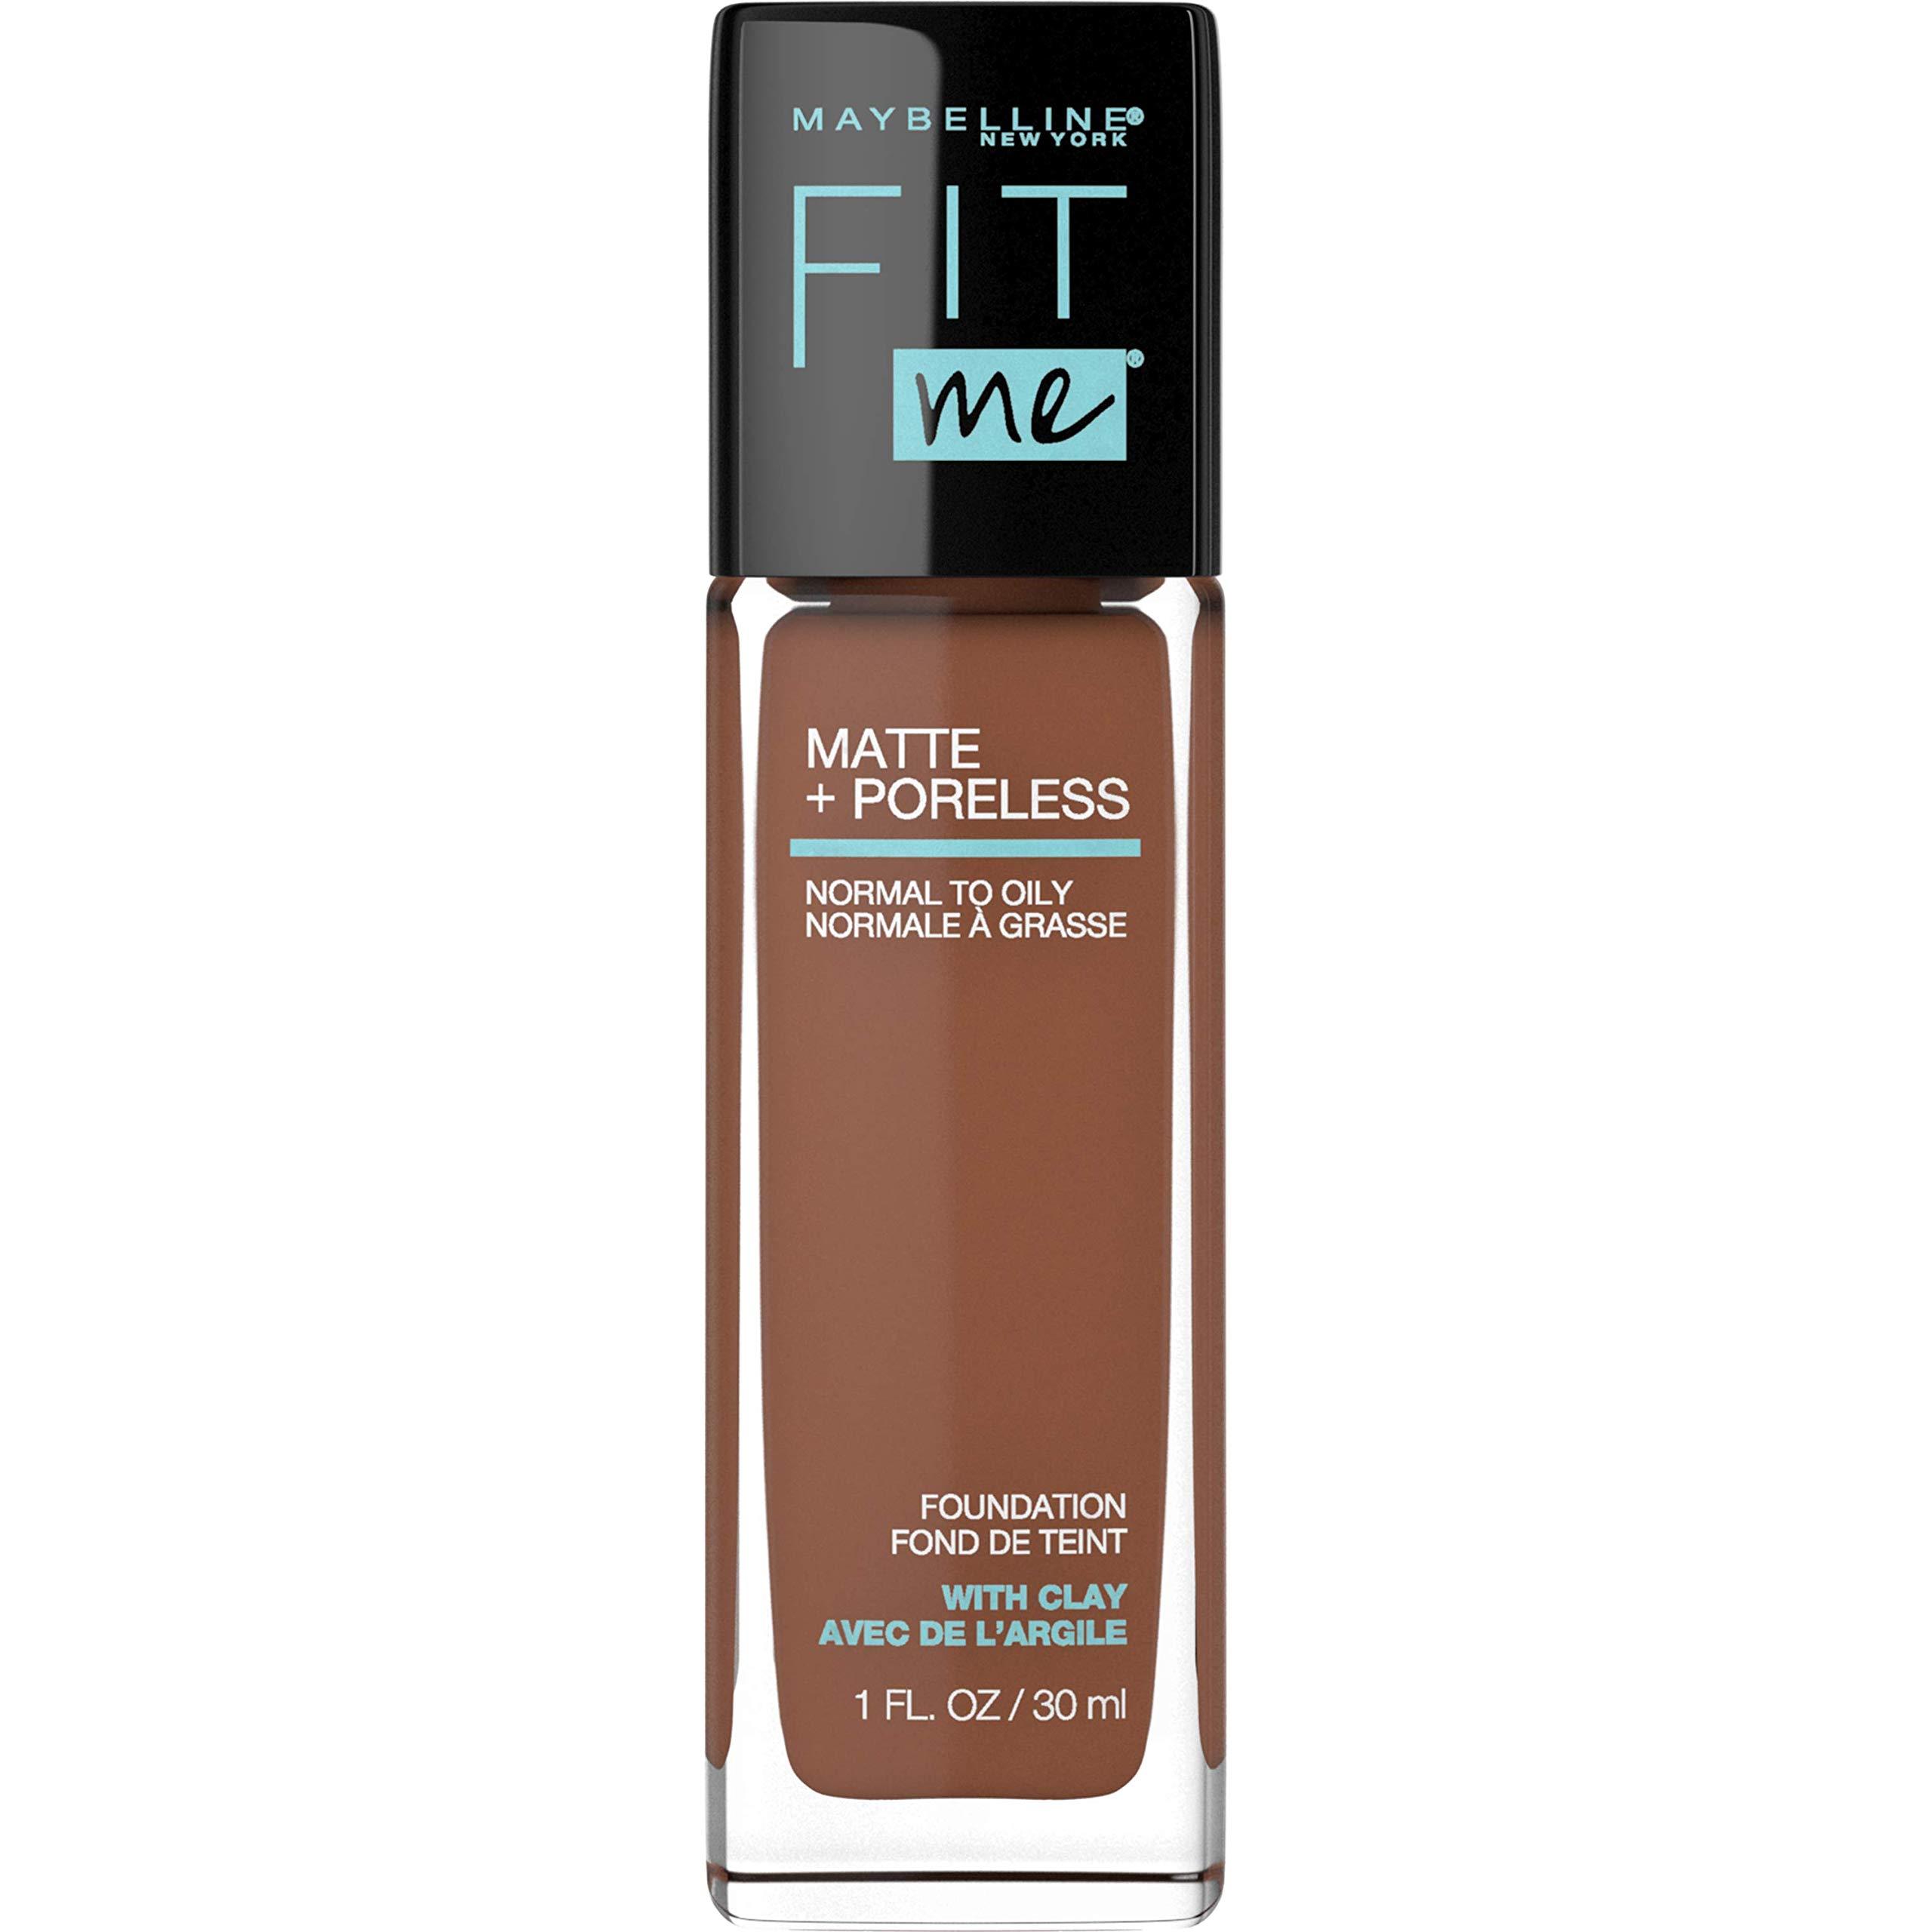 MAYBELLINE Fit Me Matte + Poreless Liquid Foundation Makeup, Deep Bronze, 1 fl; oz; Oil-Free Foundation